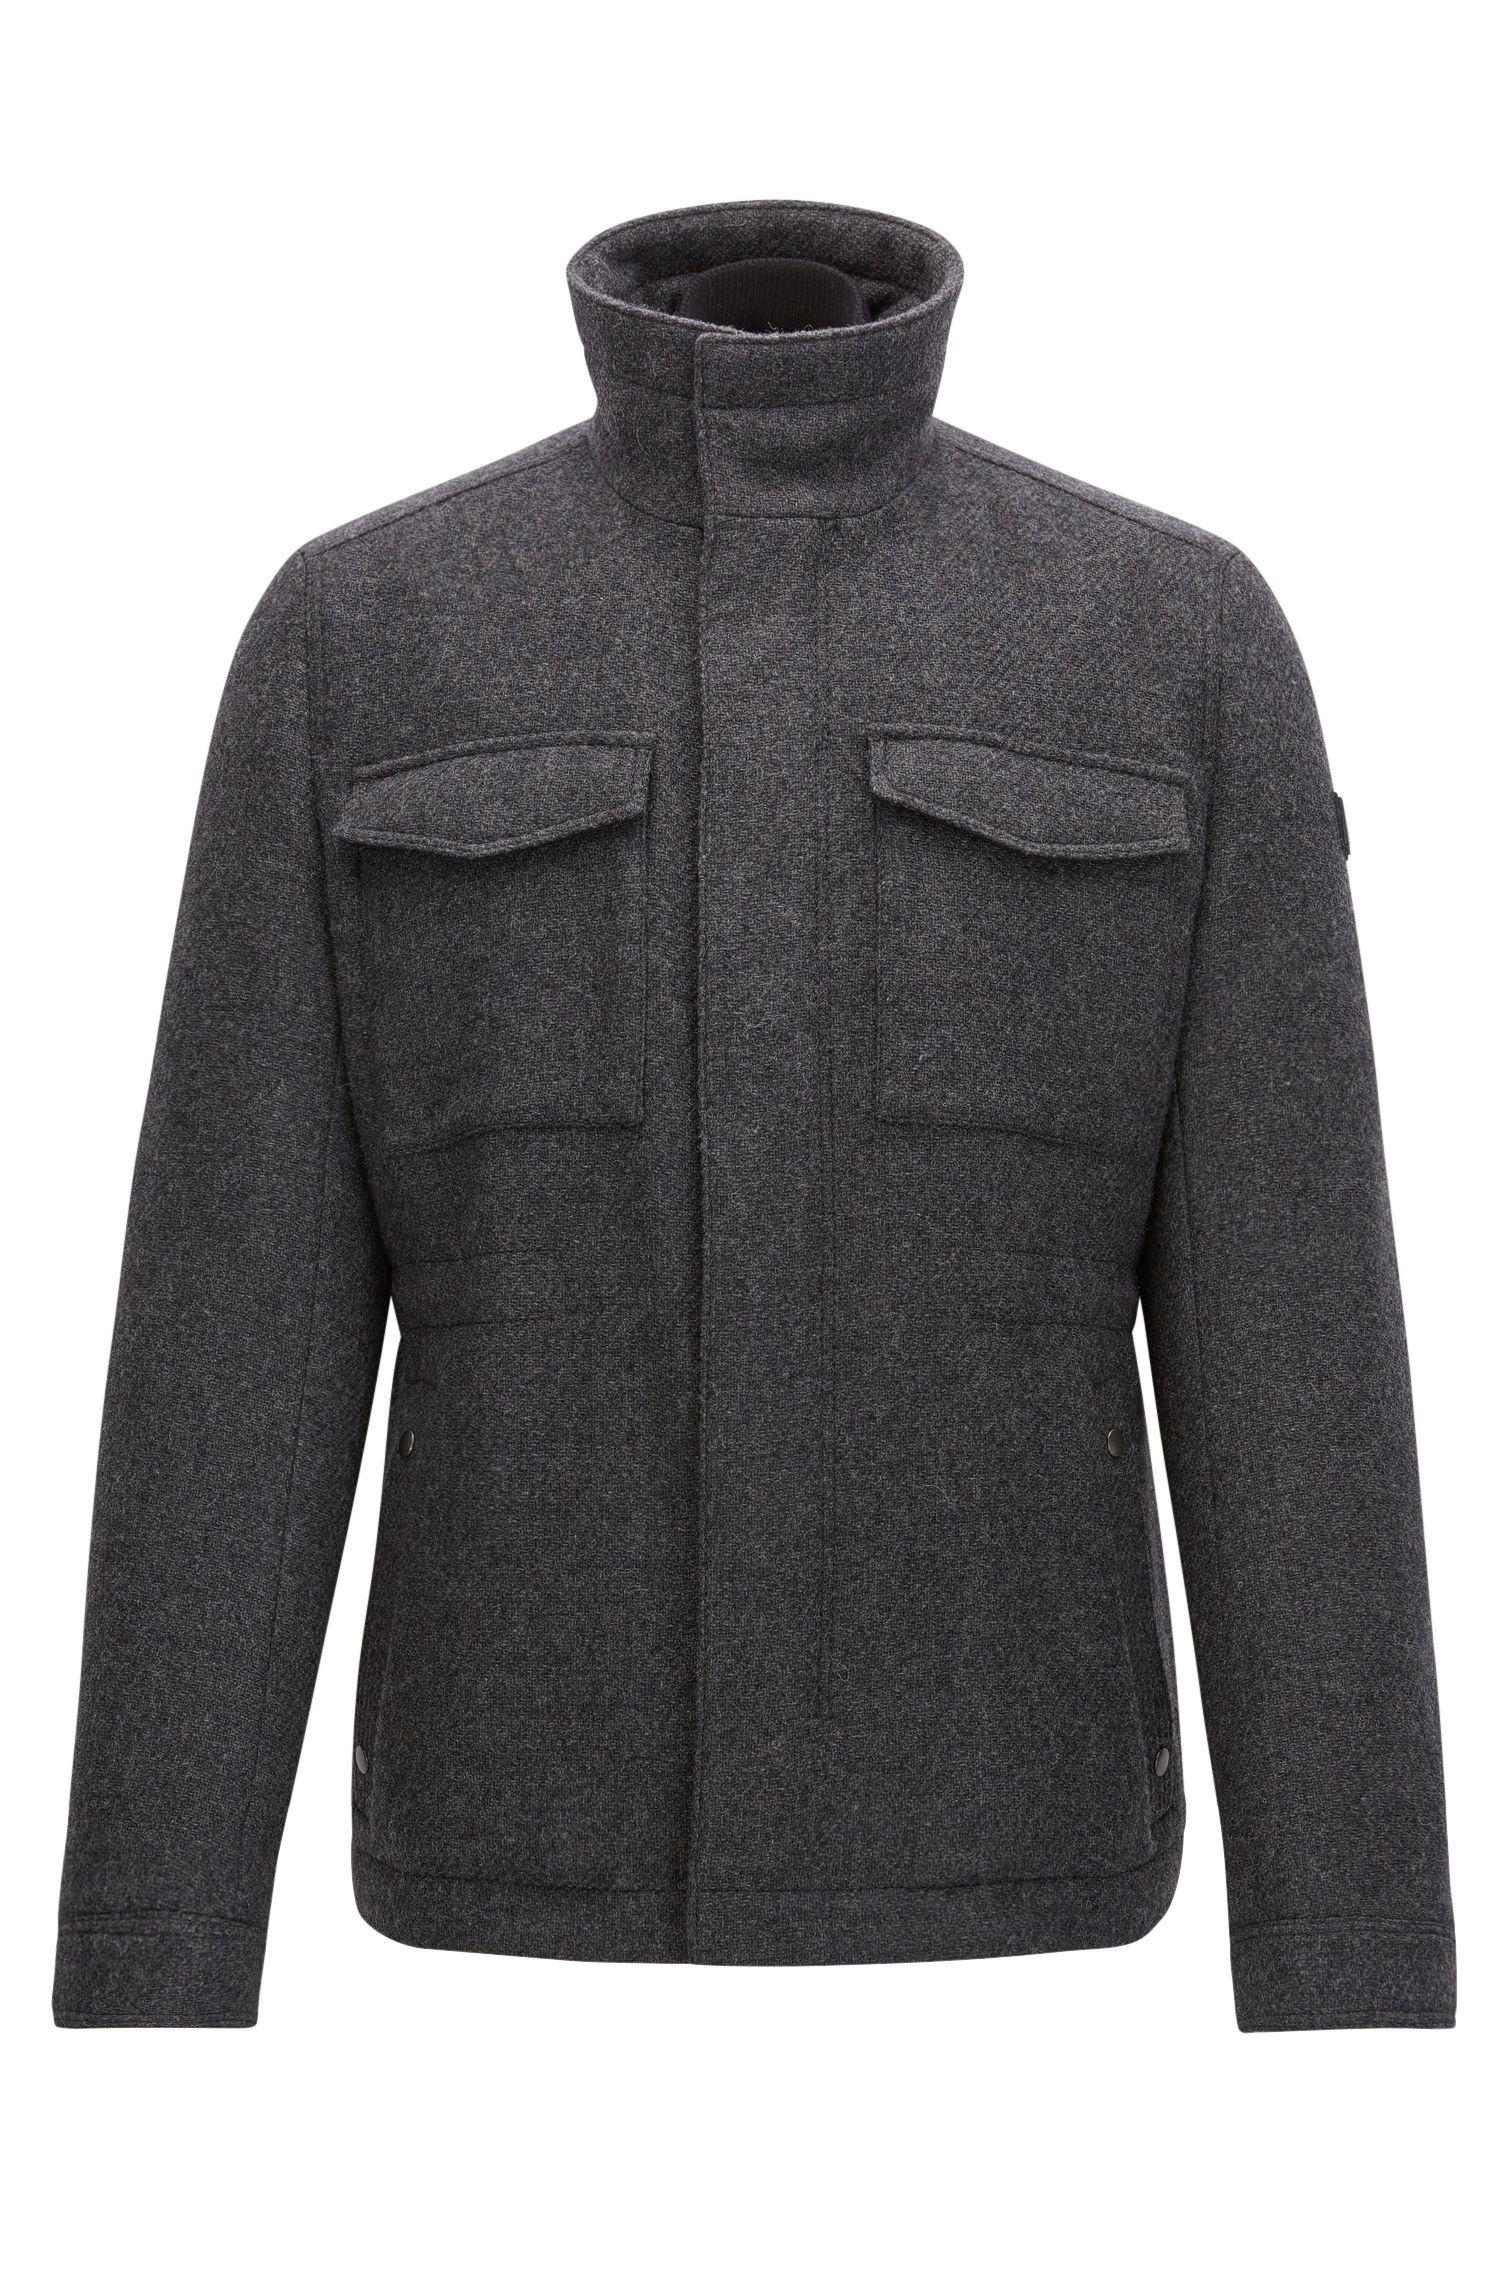 Regular-Fit Jacke aus Woll-Mix